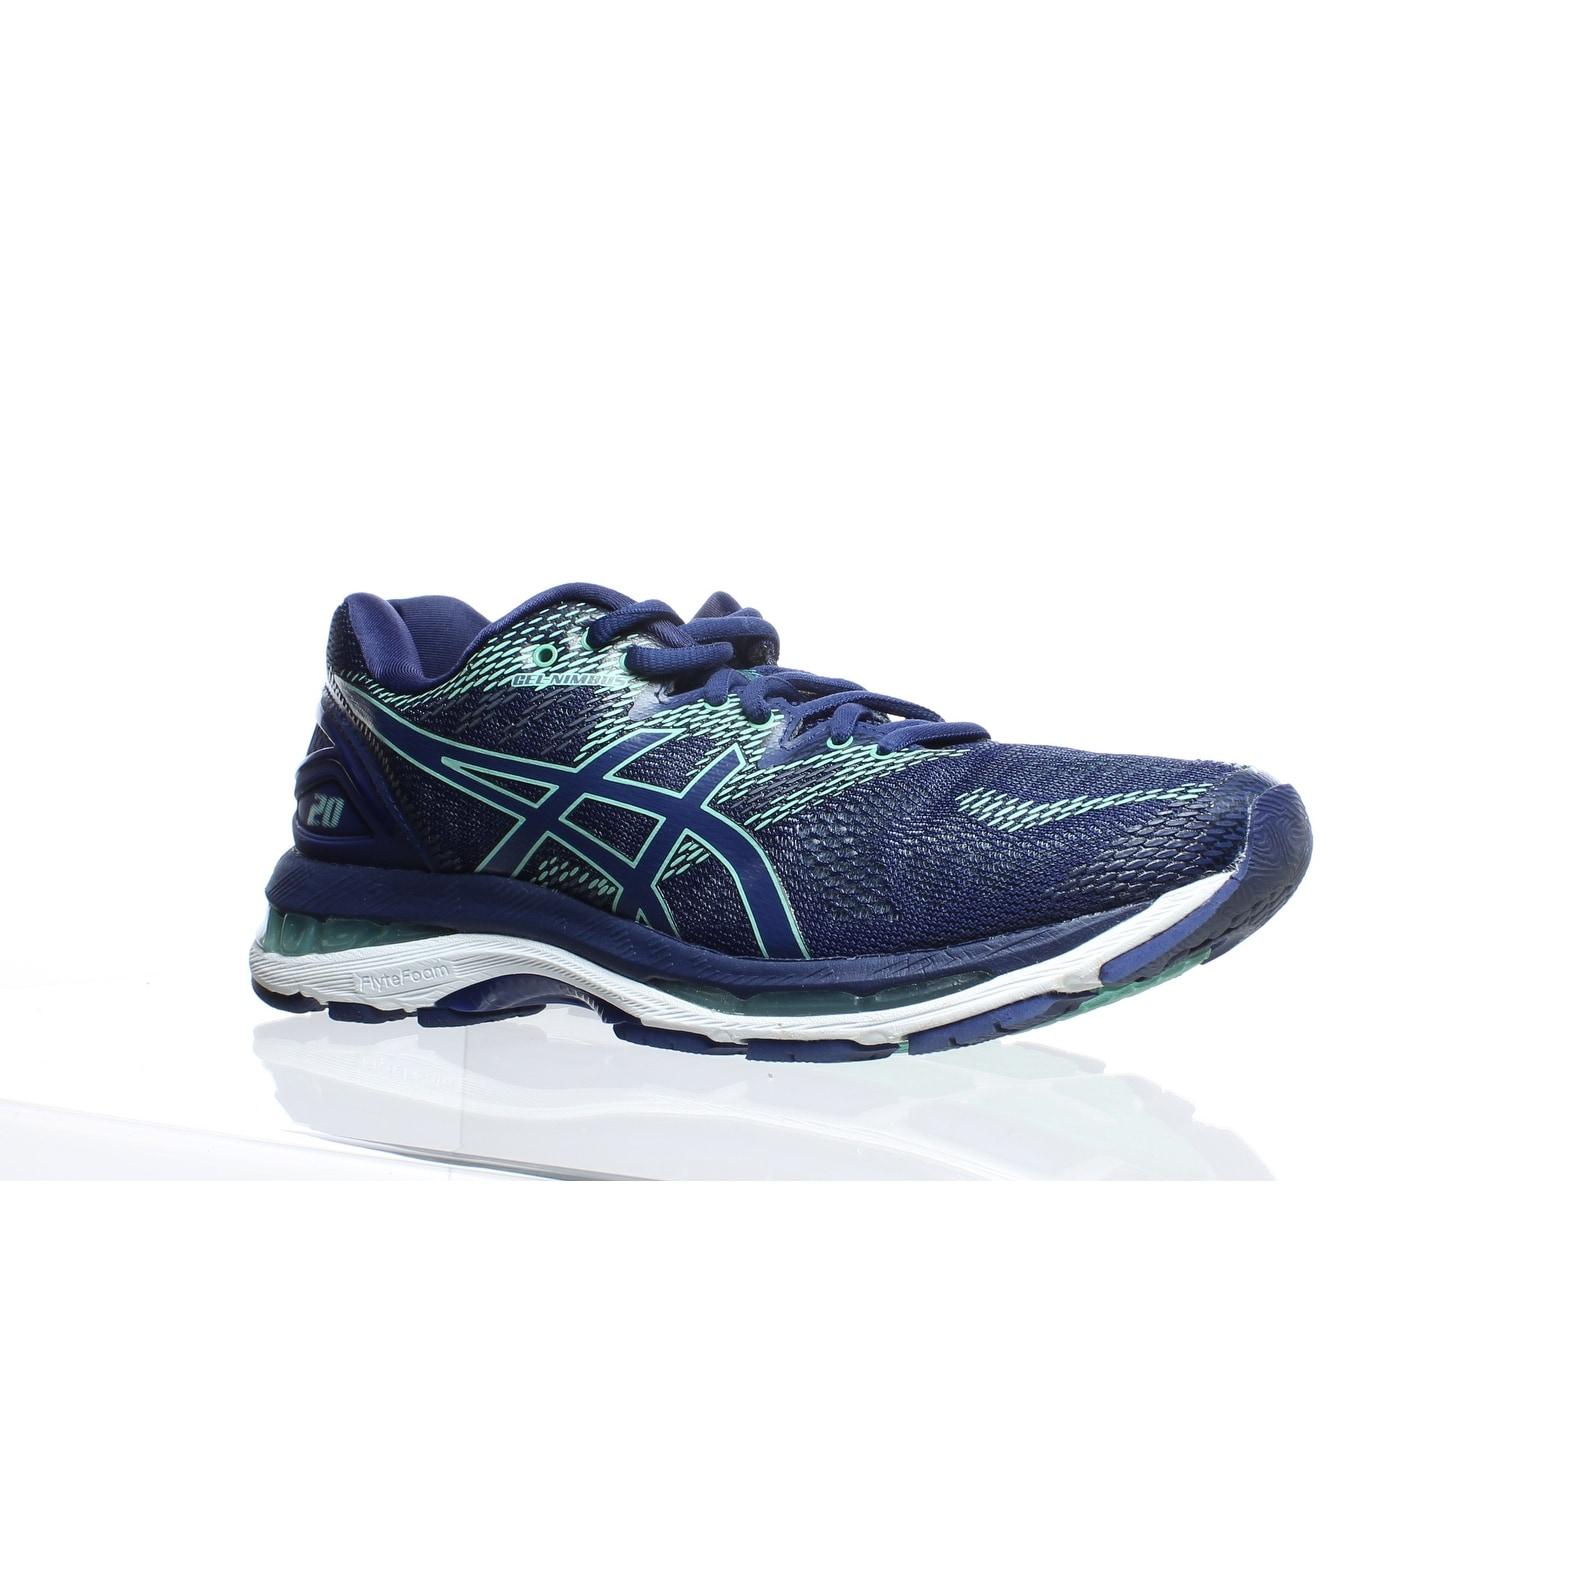 Shop ASICS Womens Gel-Nimbus 20 Blue